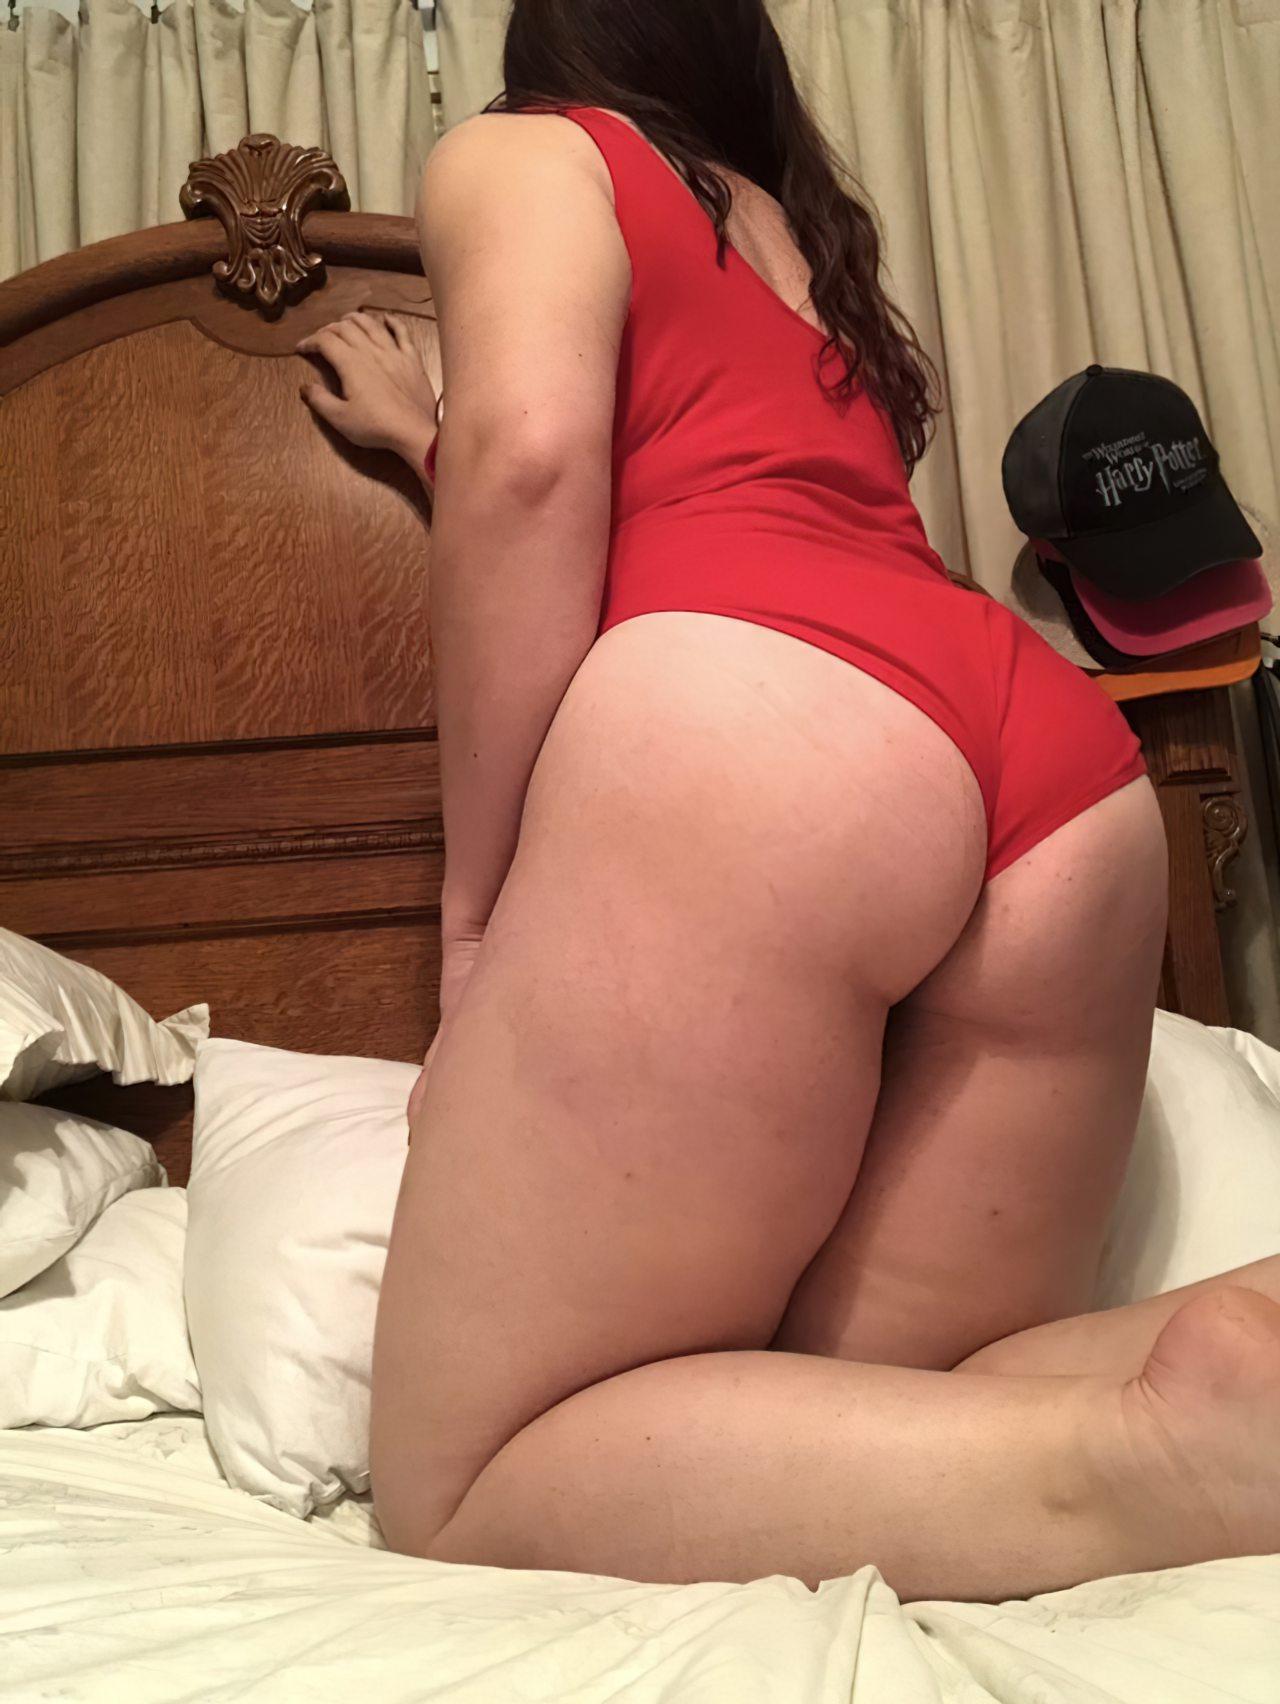 Nudes na Cama (8)